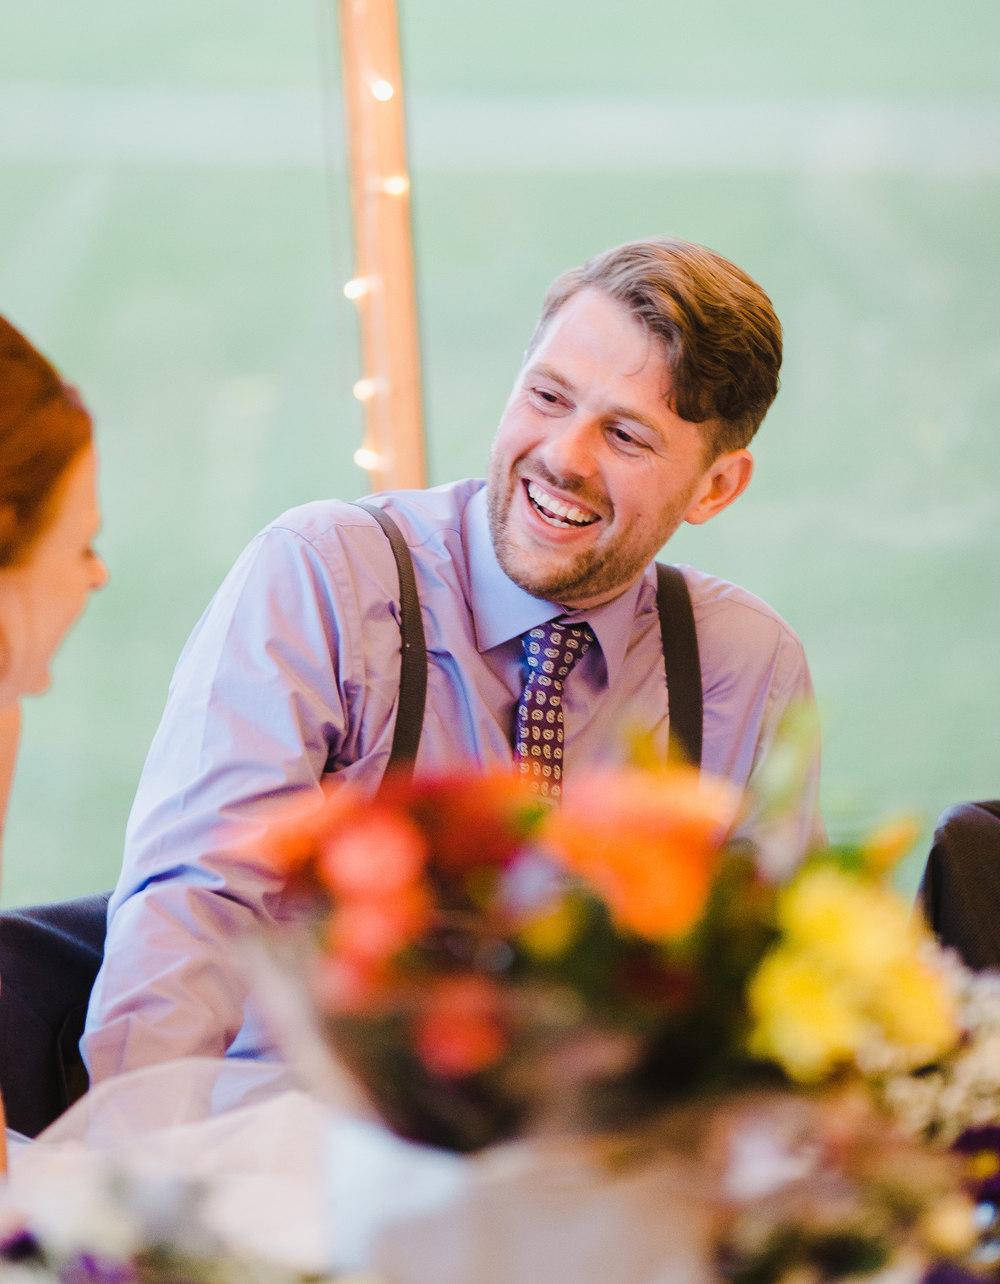 The groom smiling- Creative wedding photographer lancashire